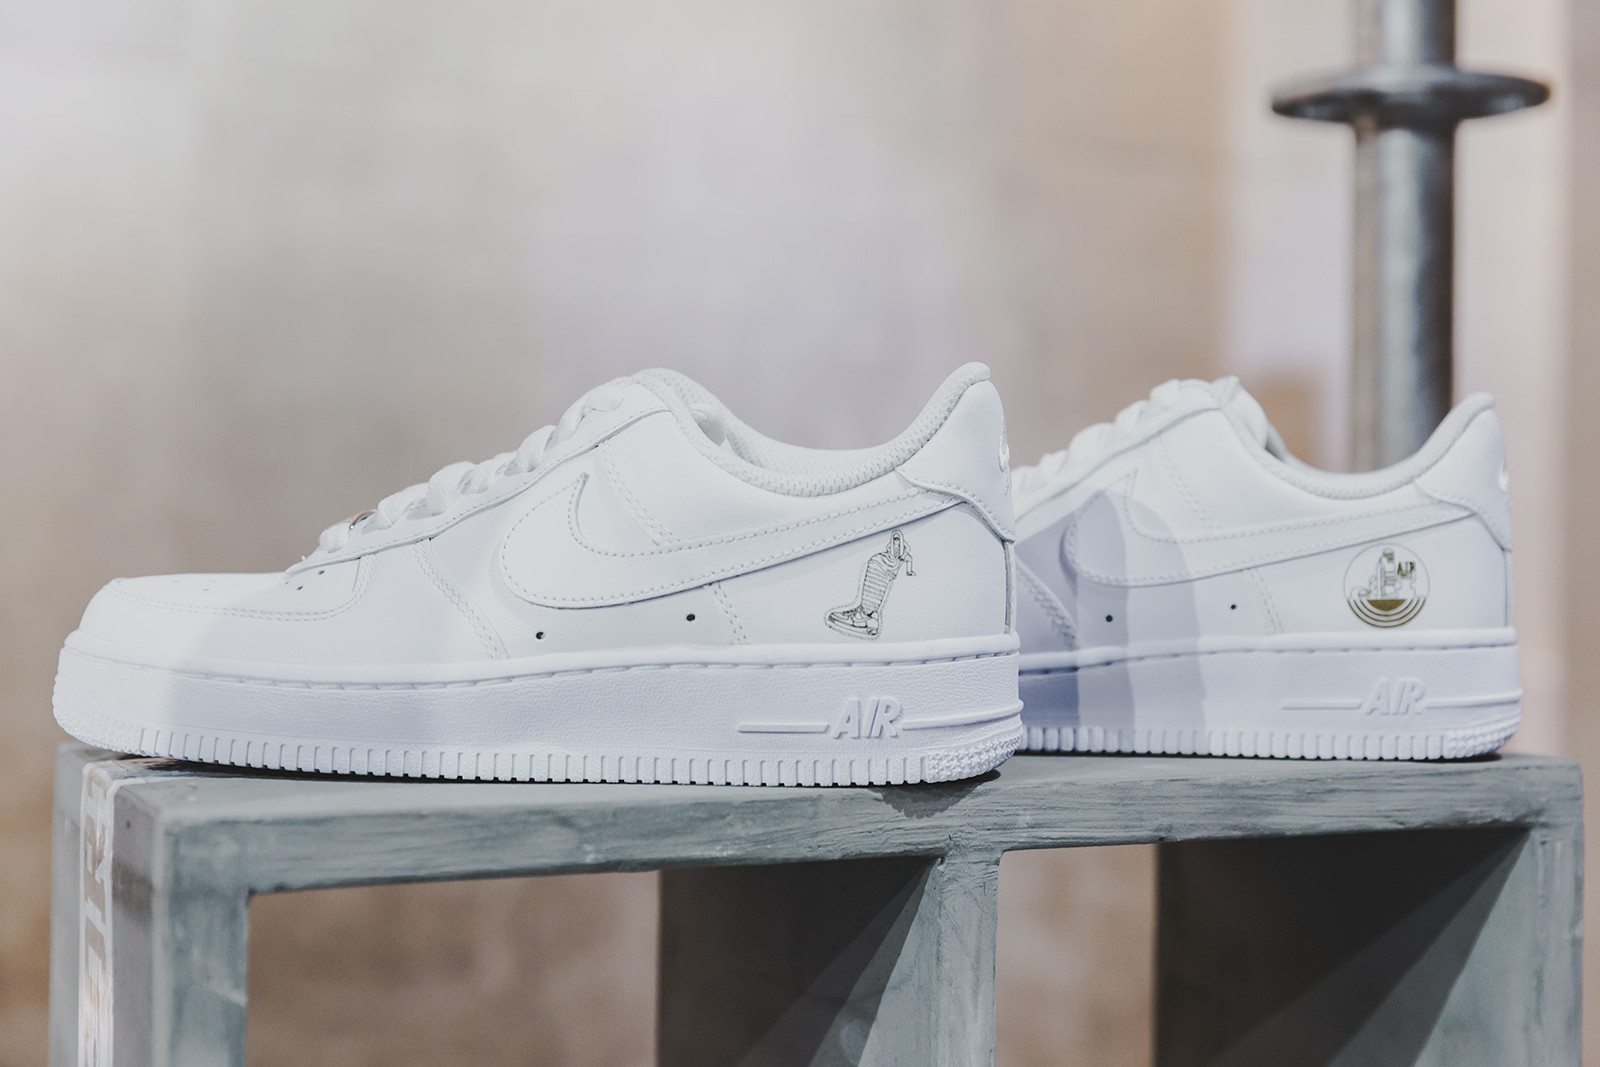 走進 Nike Air Force 1 35 週年期間限定企劃 FORCE STUDIO 香港站